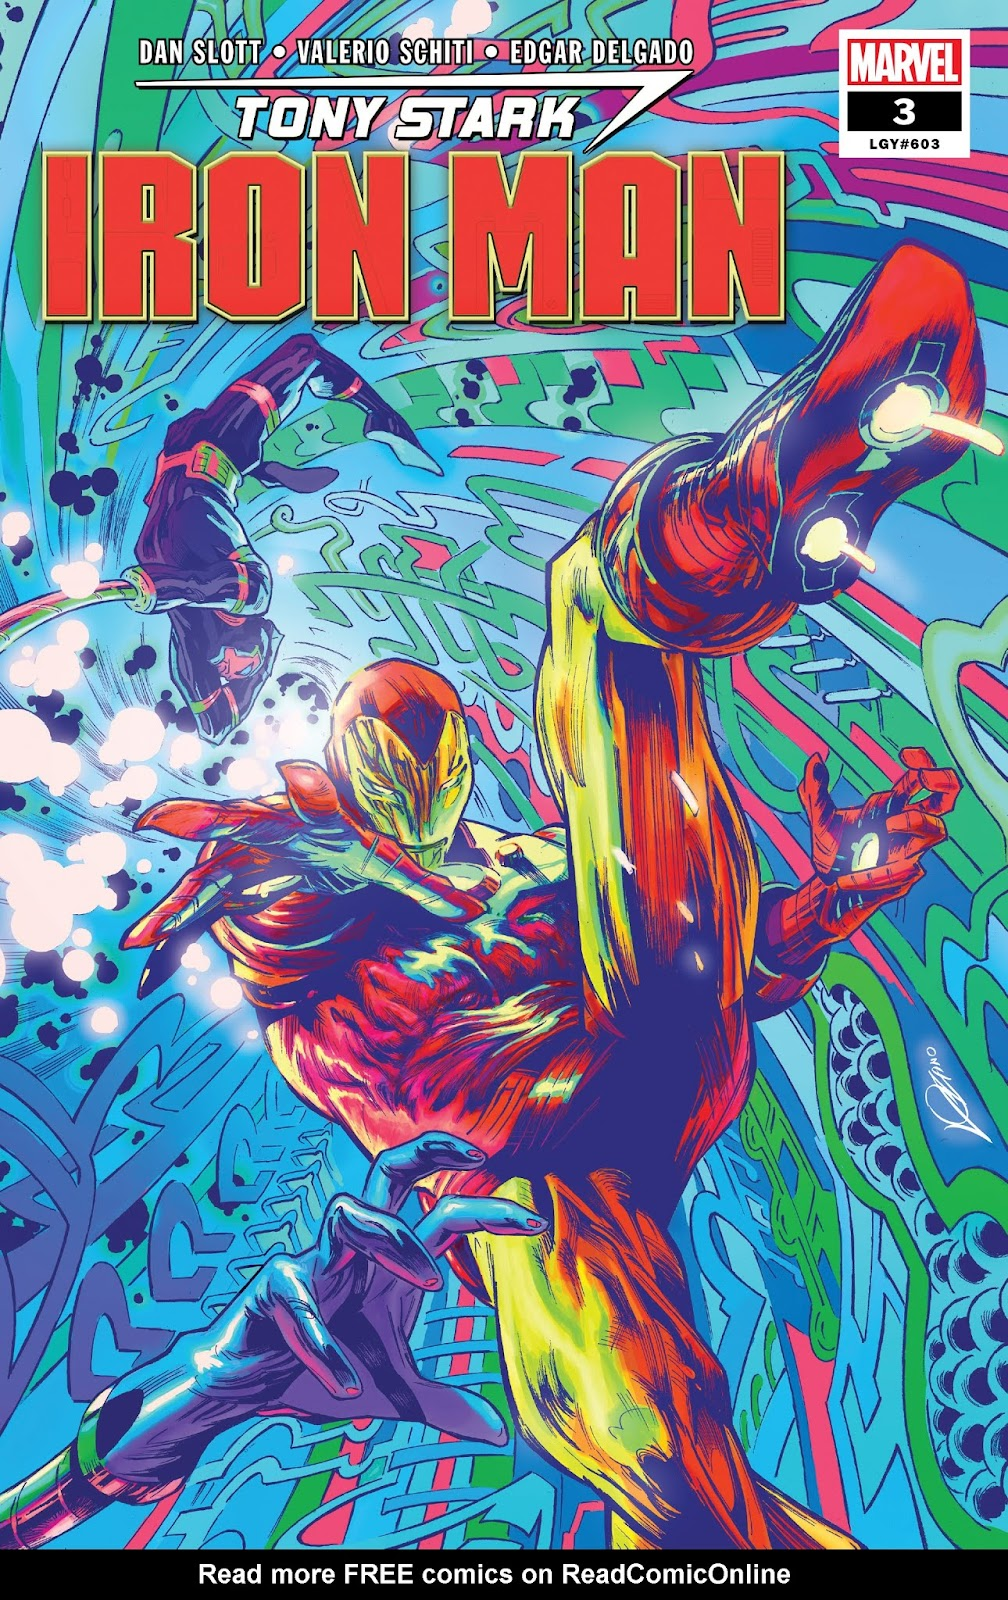 Read online Tony Stark: Iron Man comic -  Issue #3 - 1